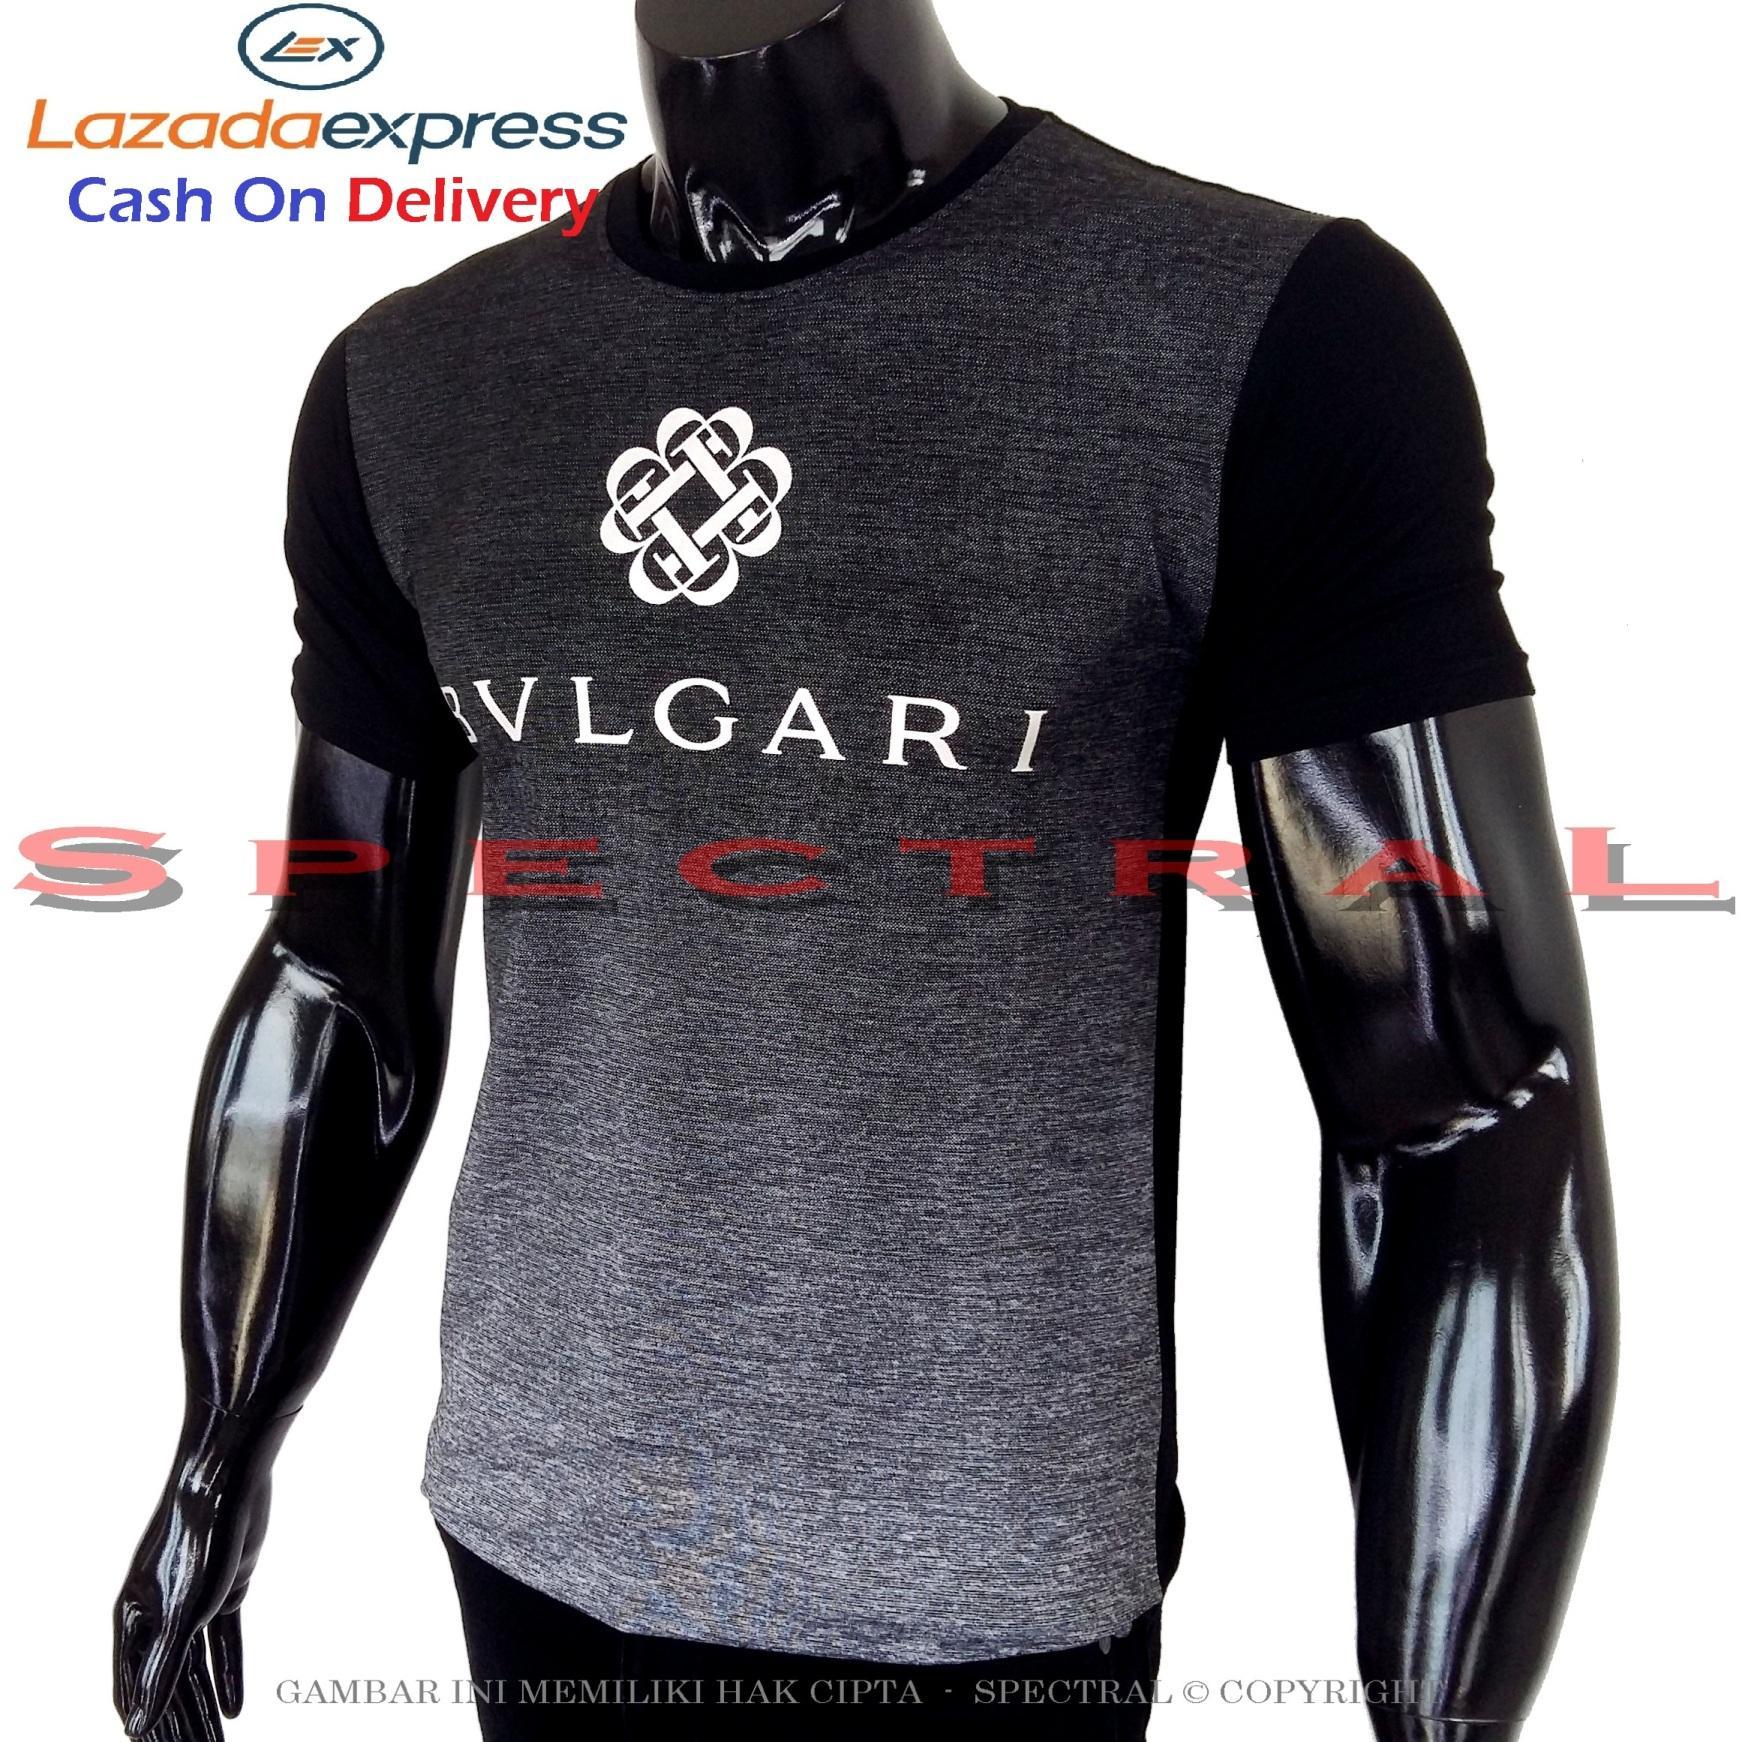 Spectral - Kaos Distro BLVGARI Soft Rayon Viscose Lycra Pola M Fit To L Simple Fashionable Tidak Pasaran Kombinasi Garis Motif Art Visual